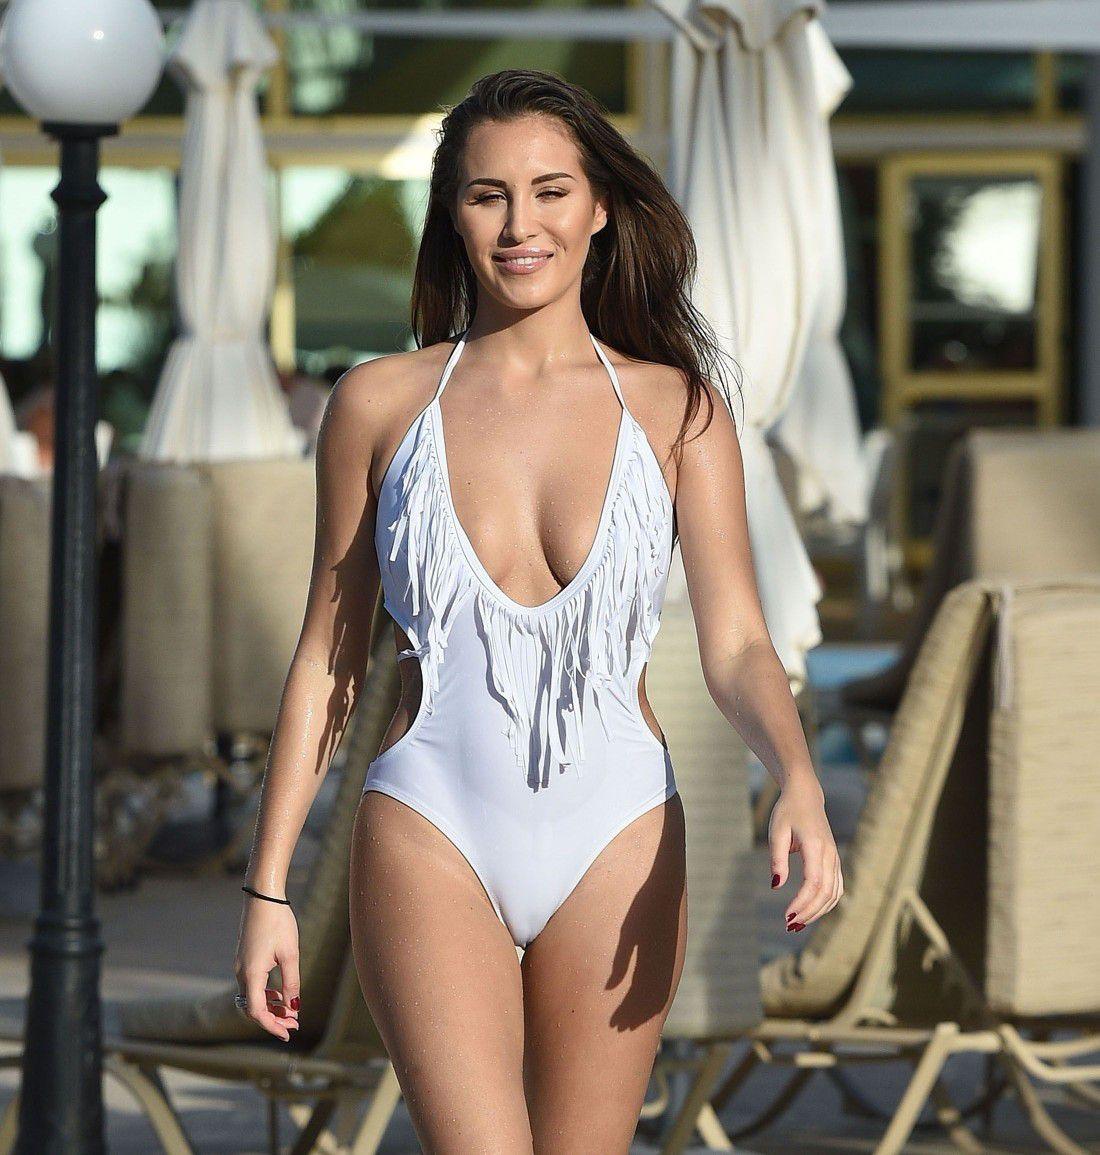 chloe-goodman-white-swimsuit-cameltoe-in-dubai-2030